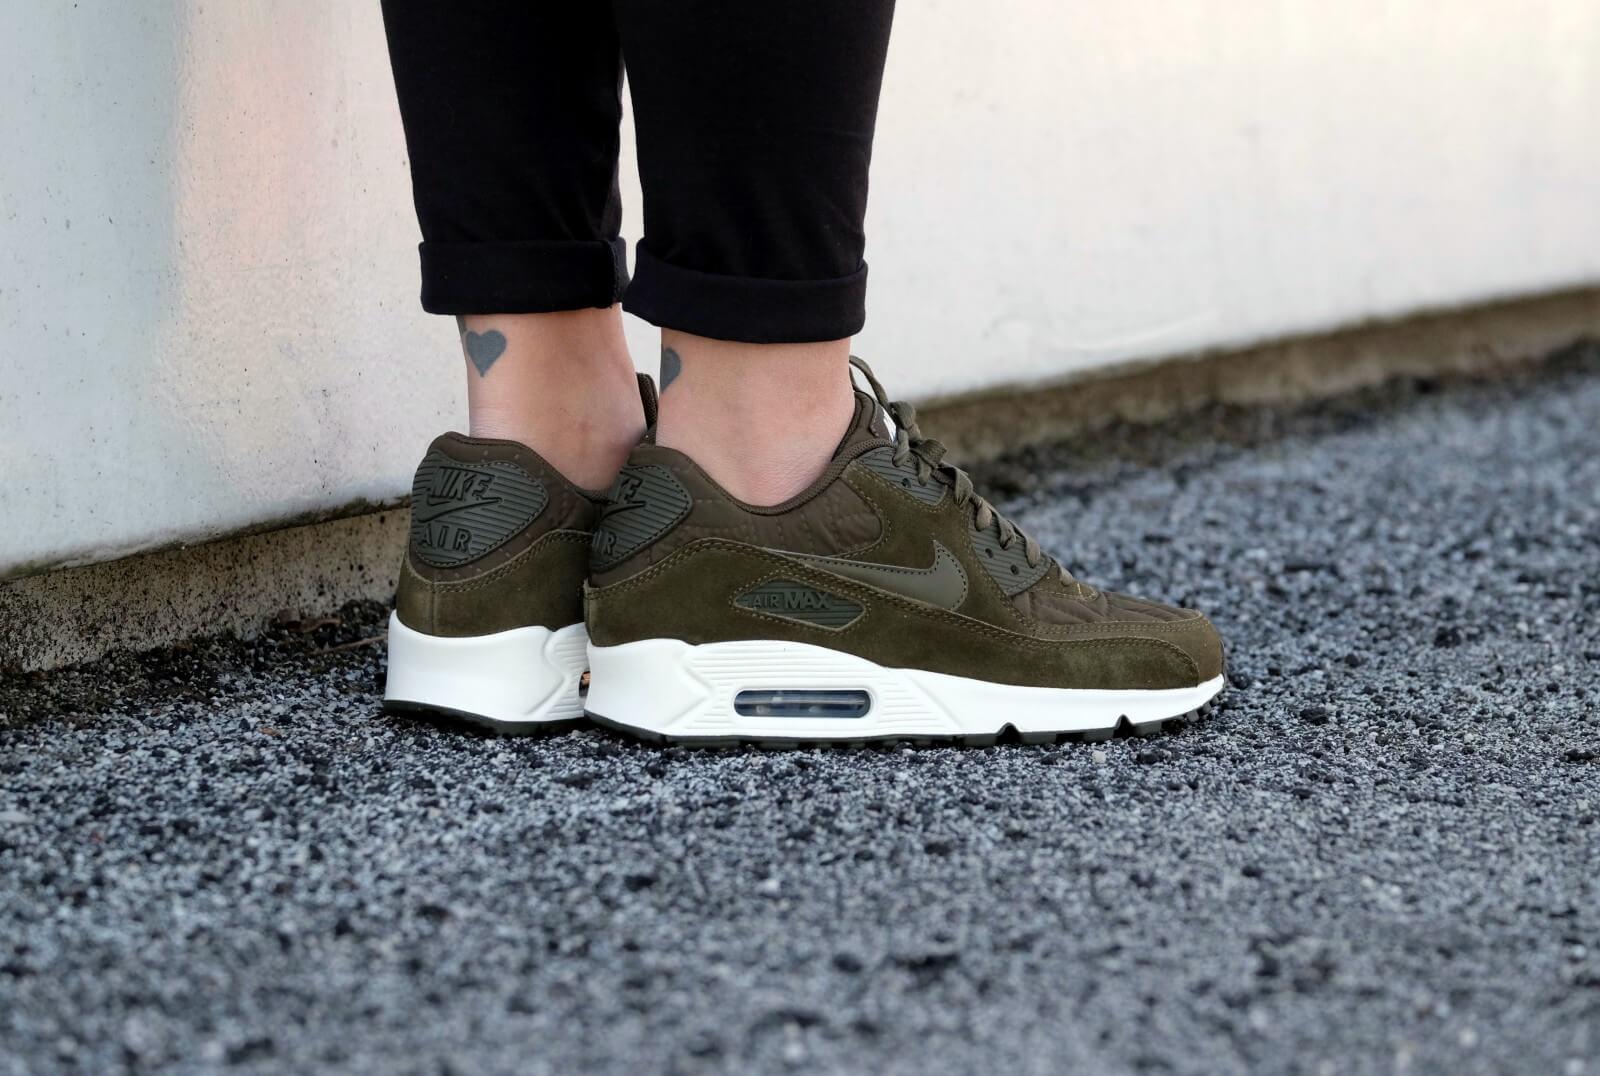 Nike Wmns Air Max 90 Premium Dark Loden Ivory 443817 300